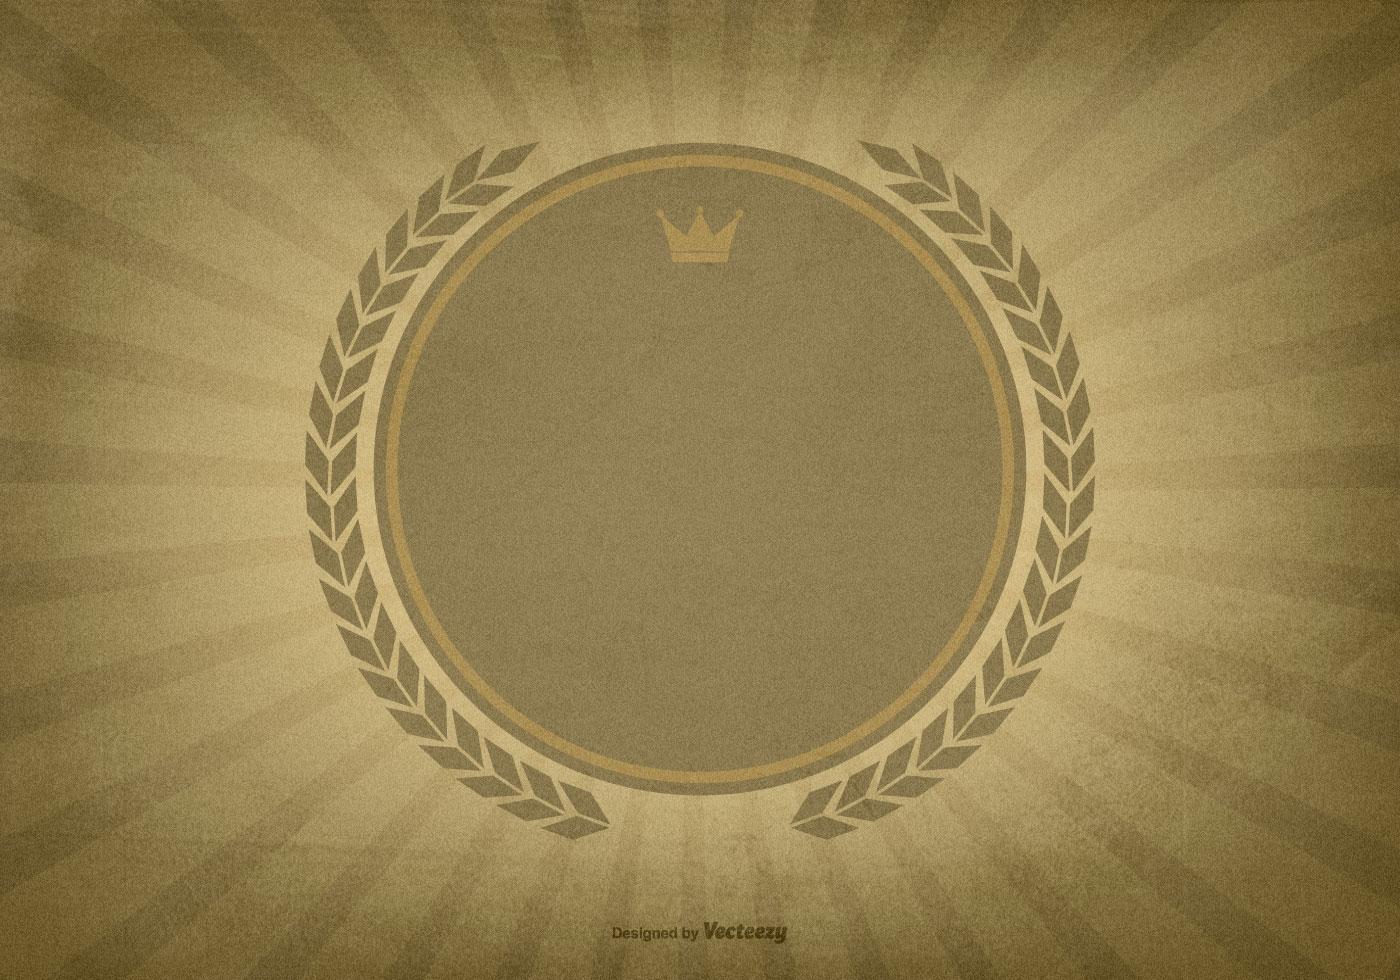 textured sunburst background wblank label download free